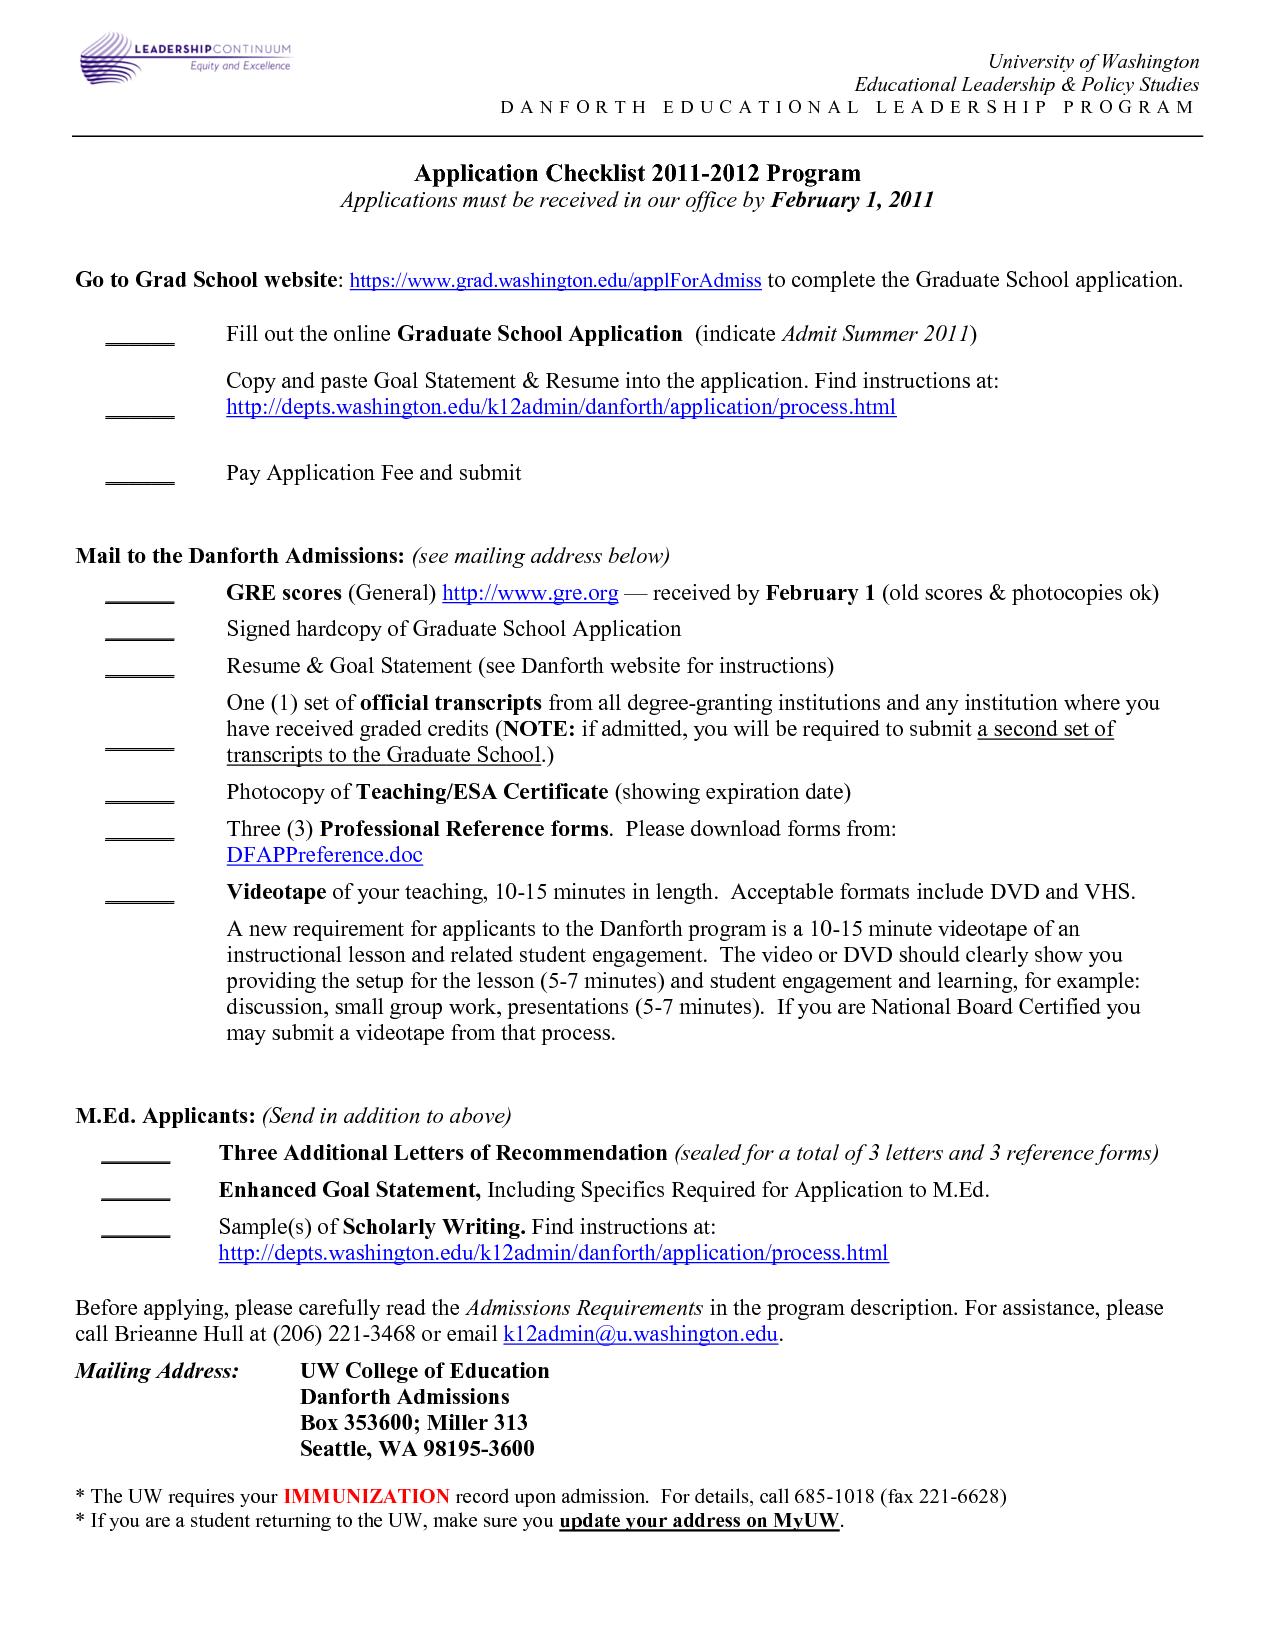 Graduate School Resume Http Www Resumecareer Info Graduate School Resume 5 School Application Graduate School Job Resume Examples